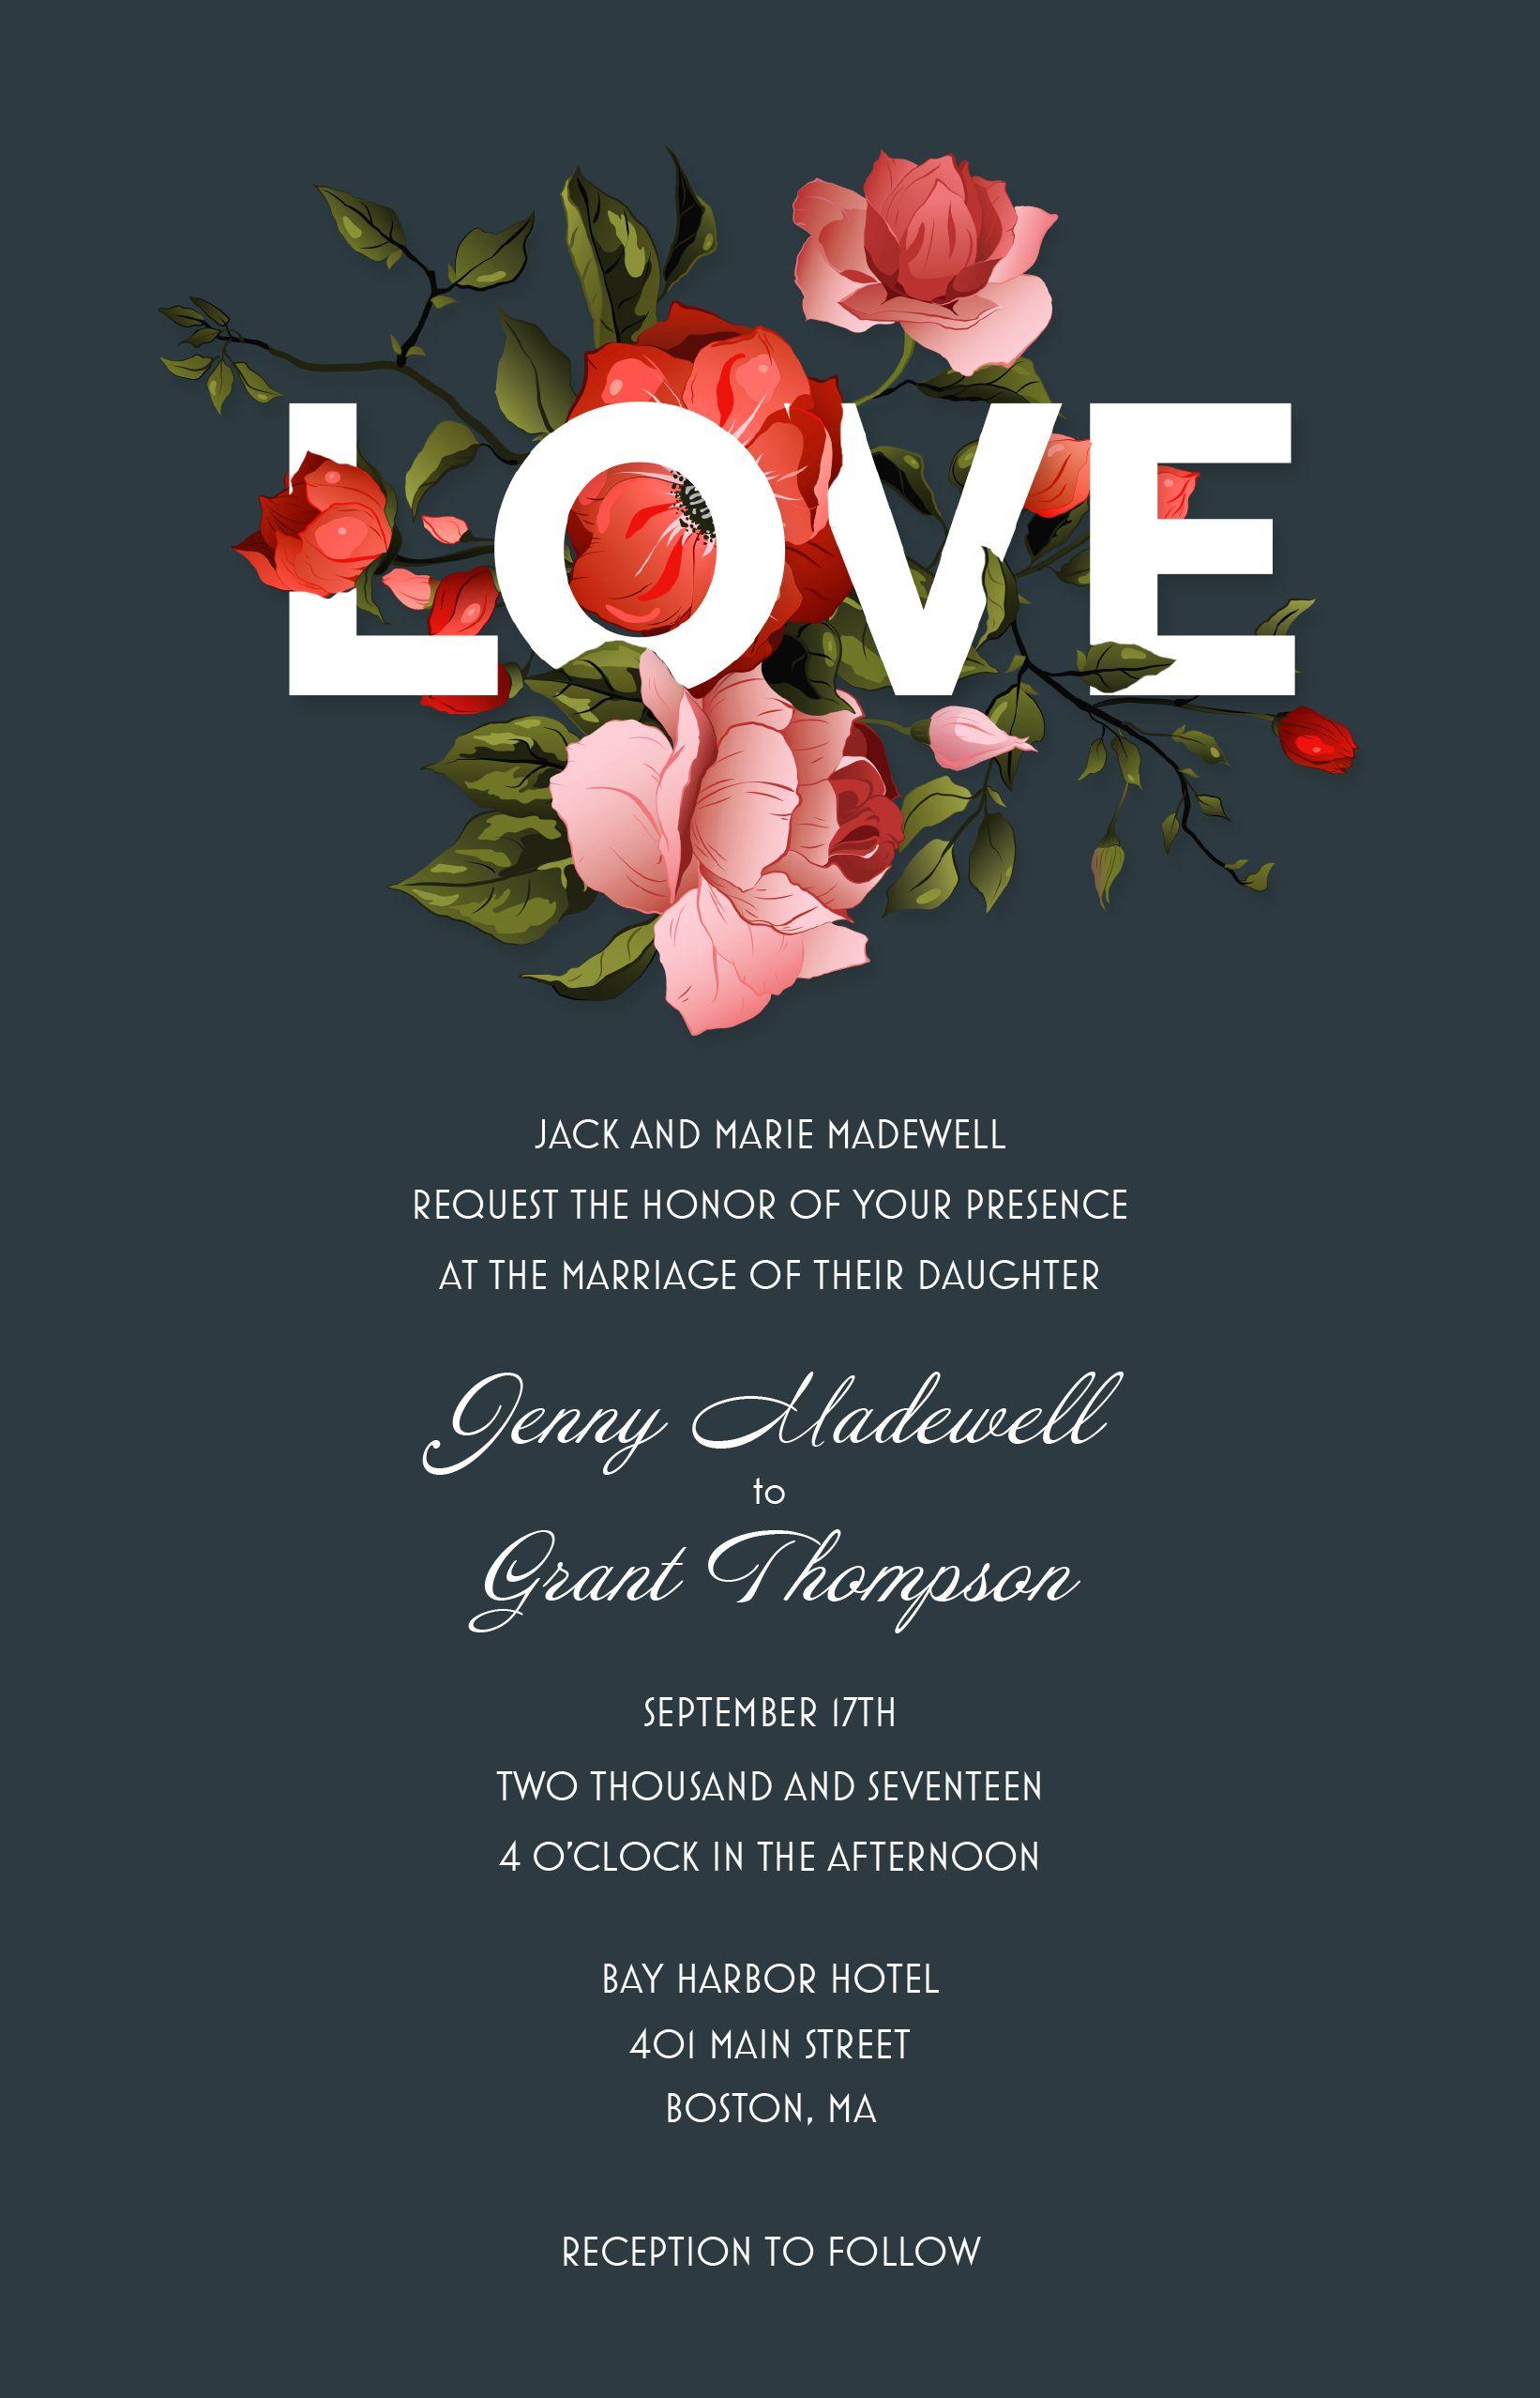 Floral wedding invitations vistaprint bold floral wedding floral wedding invitations vistaprint monicamarmolfo Gallery